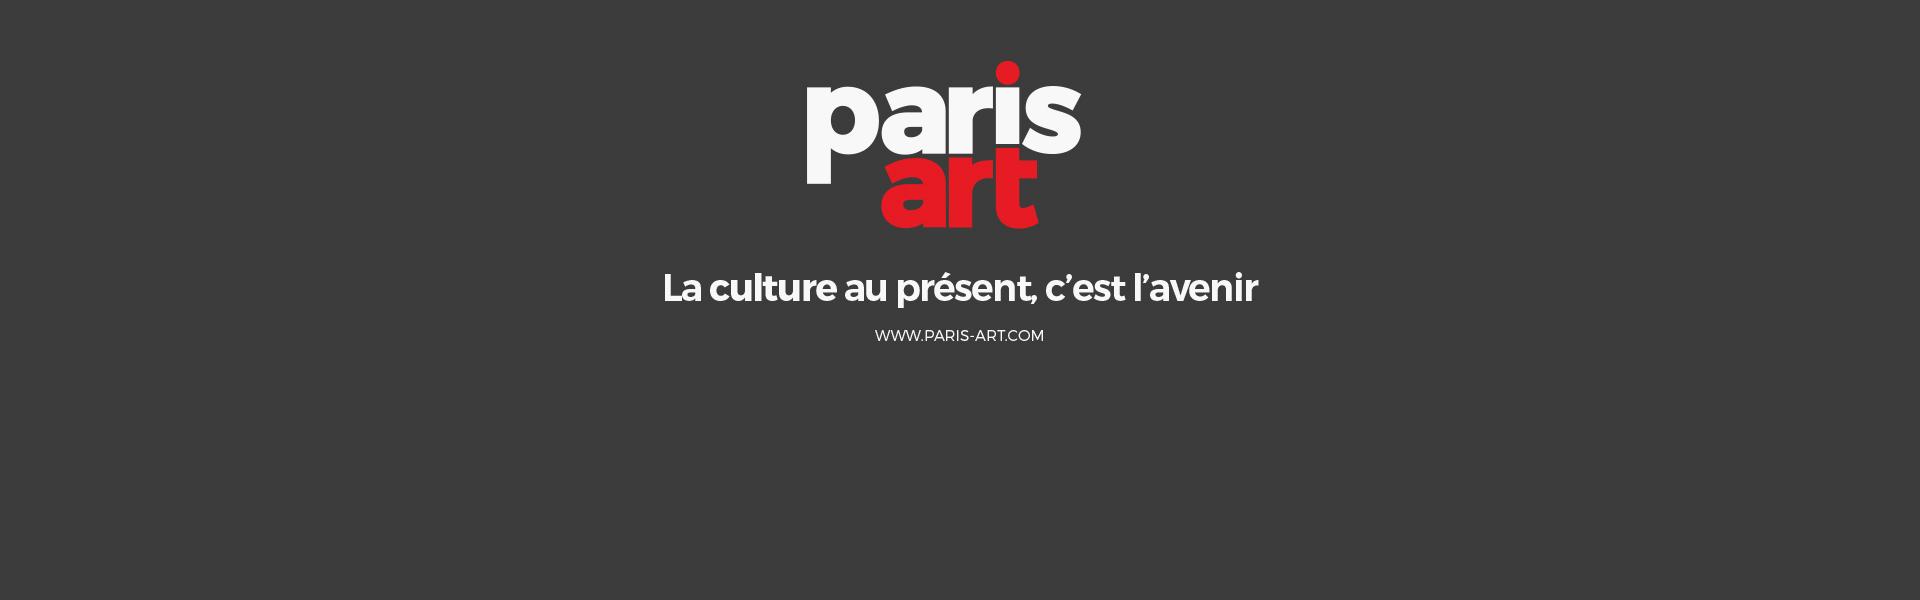 paris-art-paris-2016